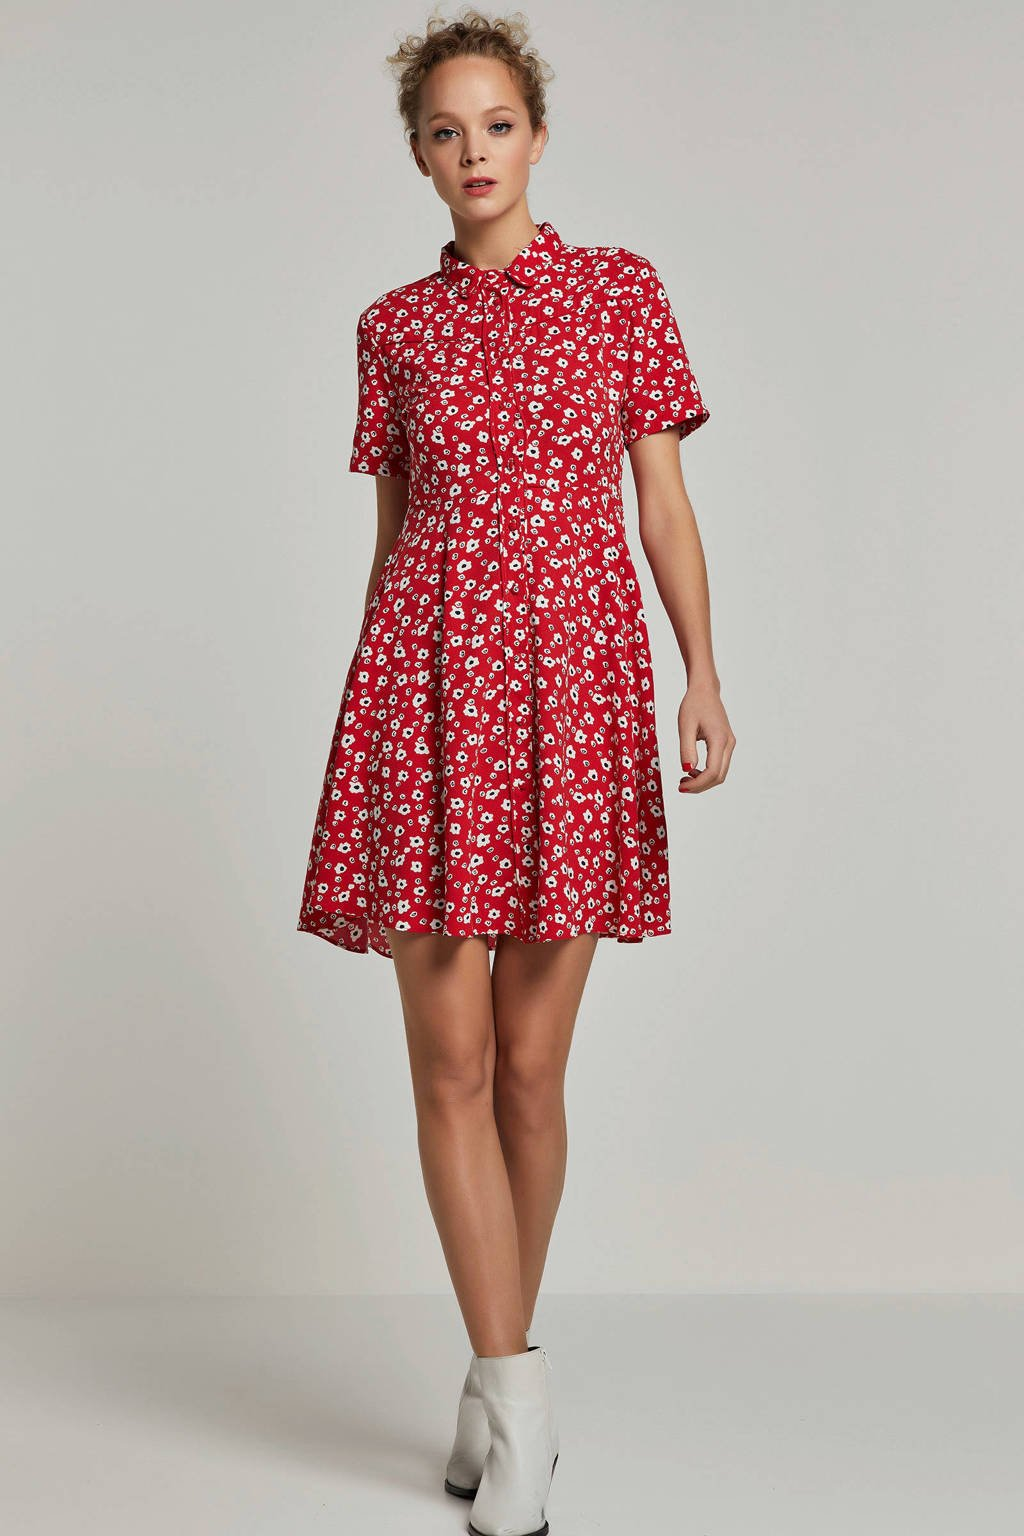 whkmp's own A-lijn blousejurk met bloemenprint, Rood